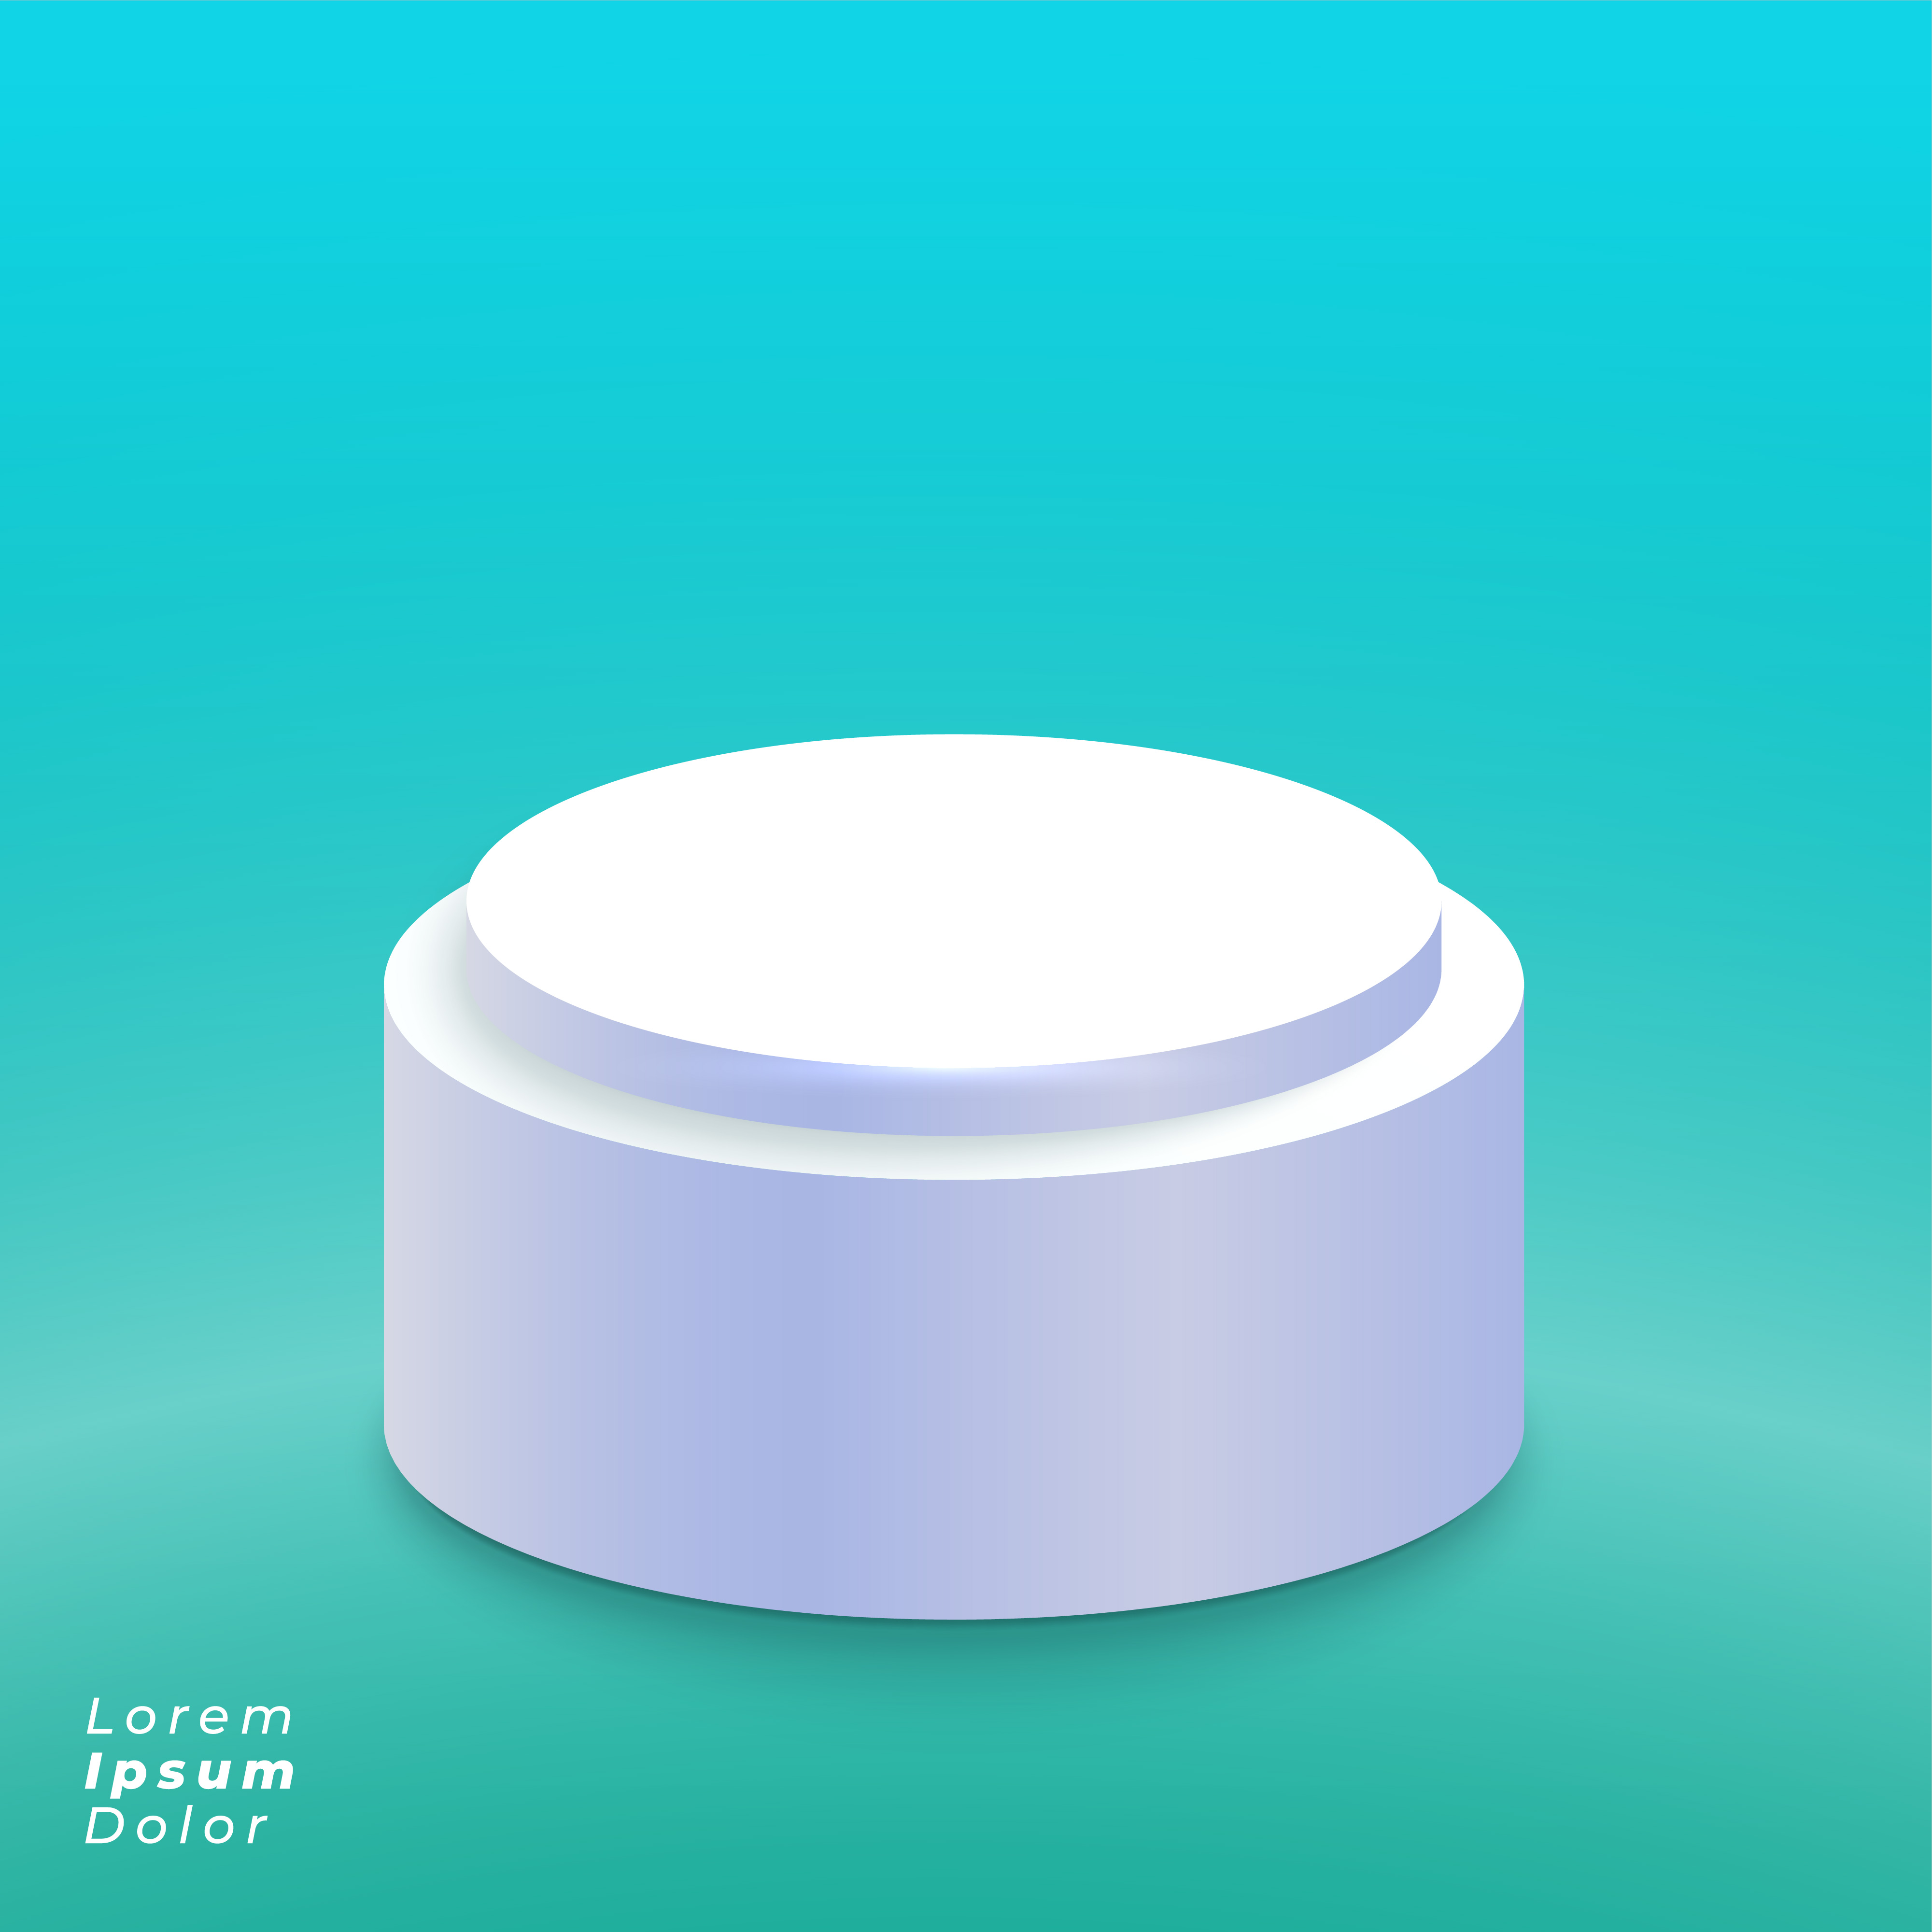 White Studio Background With Podium: Elegant Studio With Podium Or Product Display Background